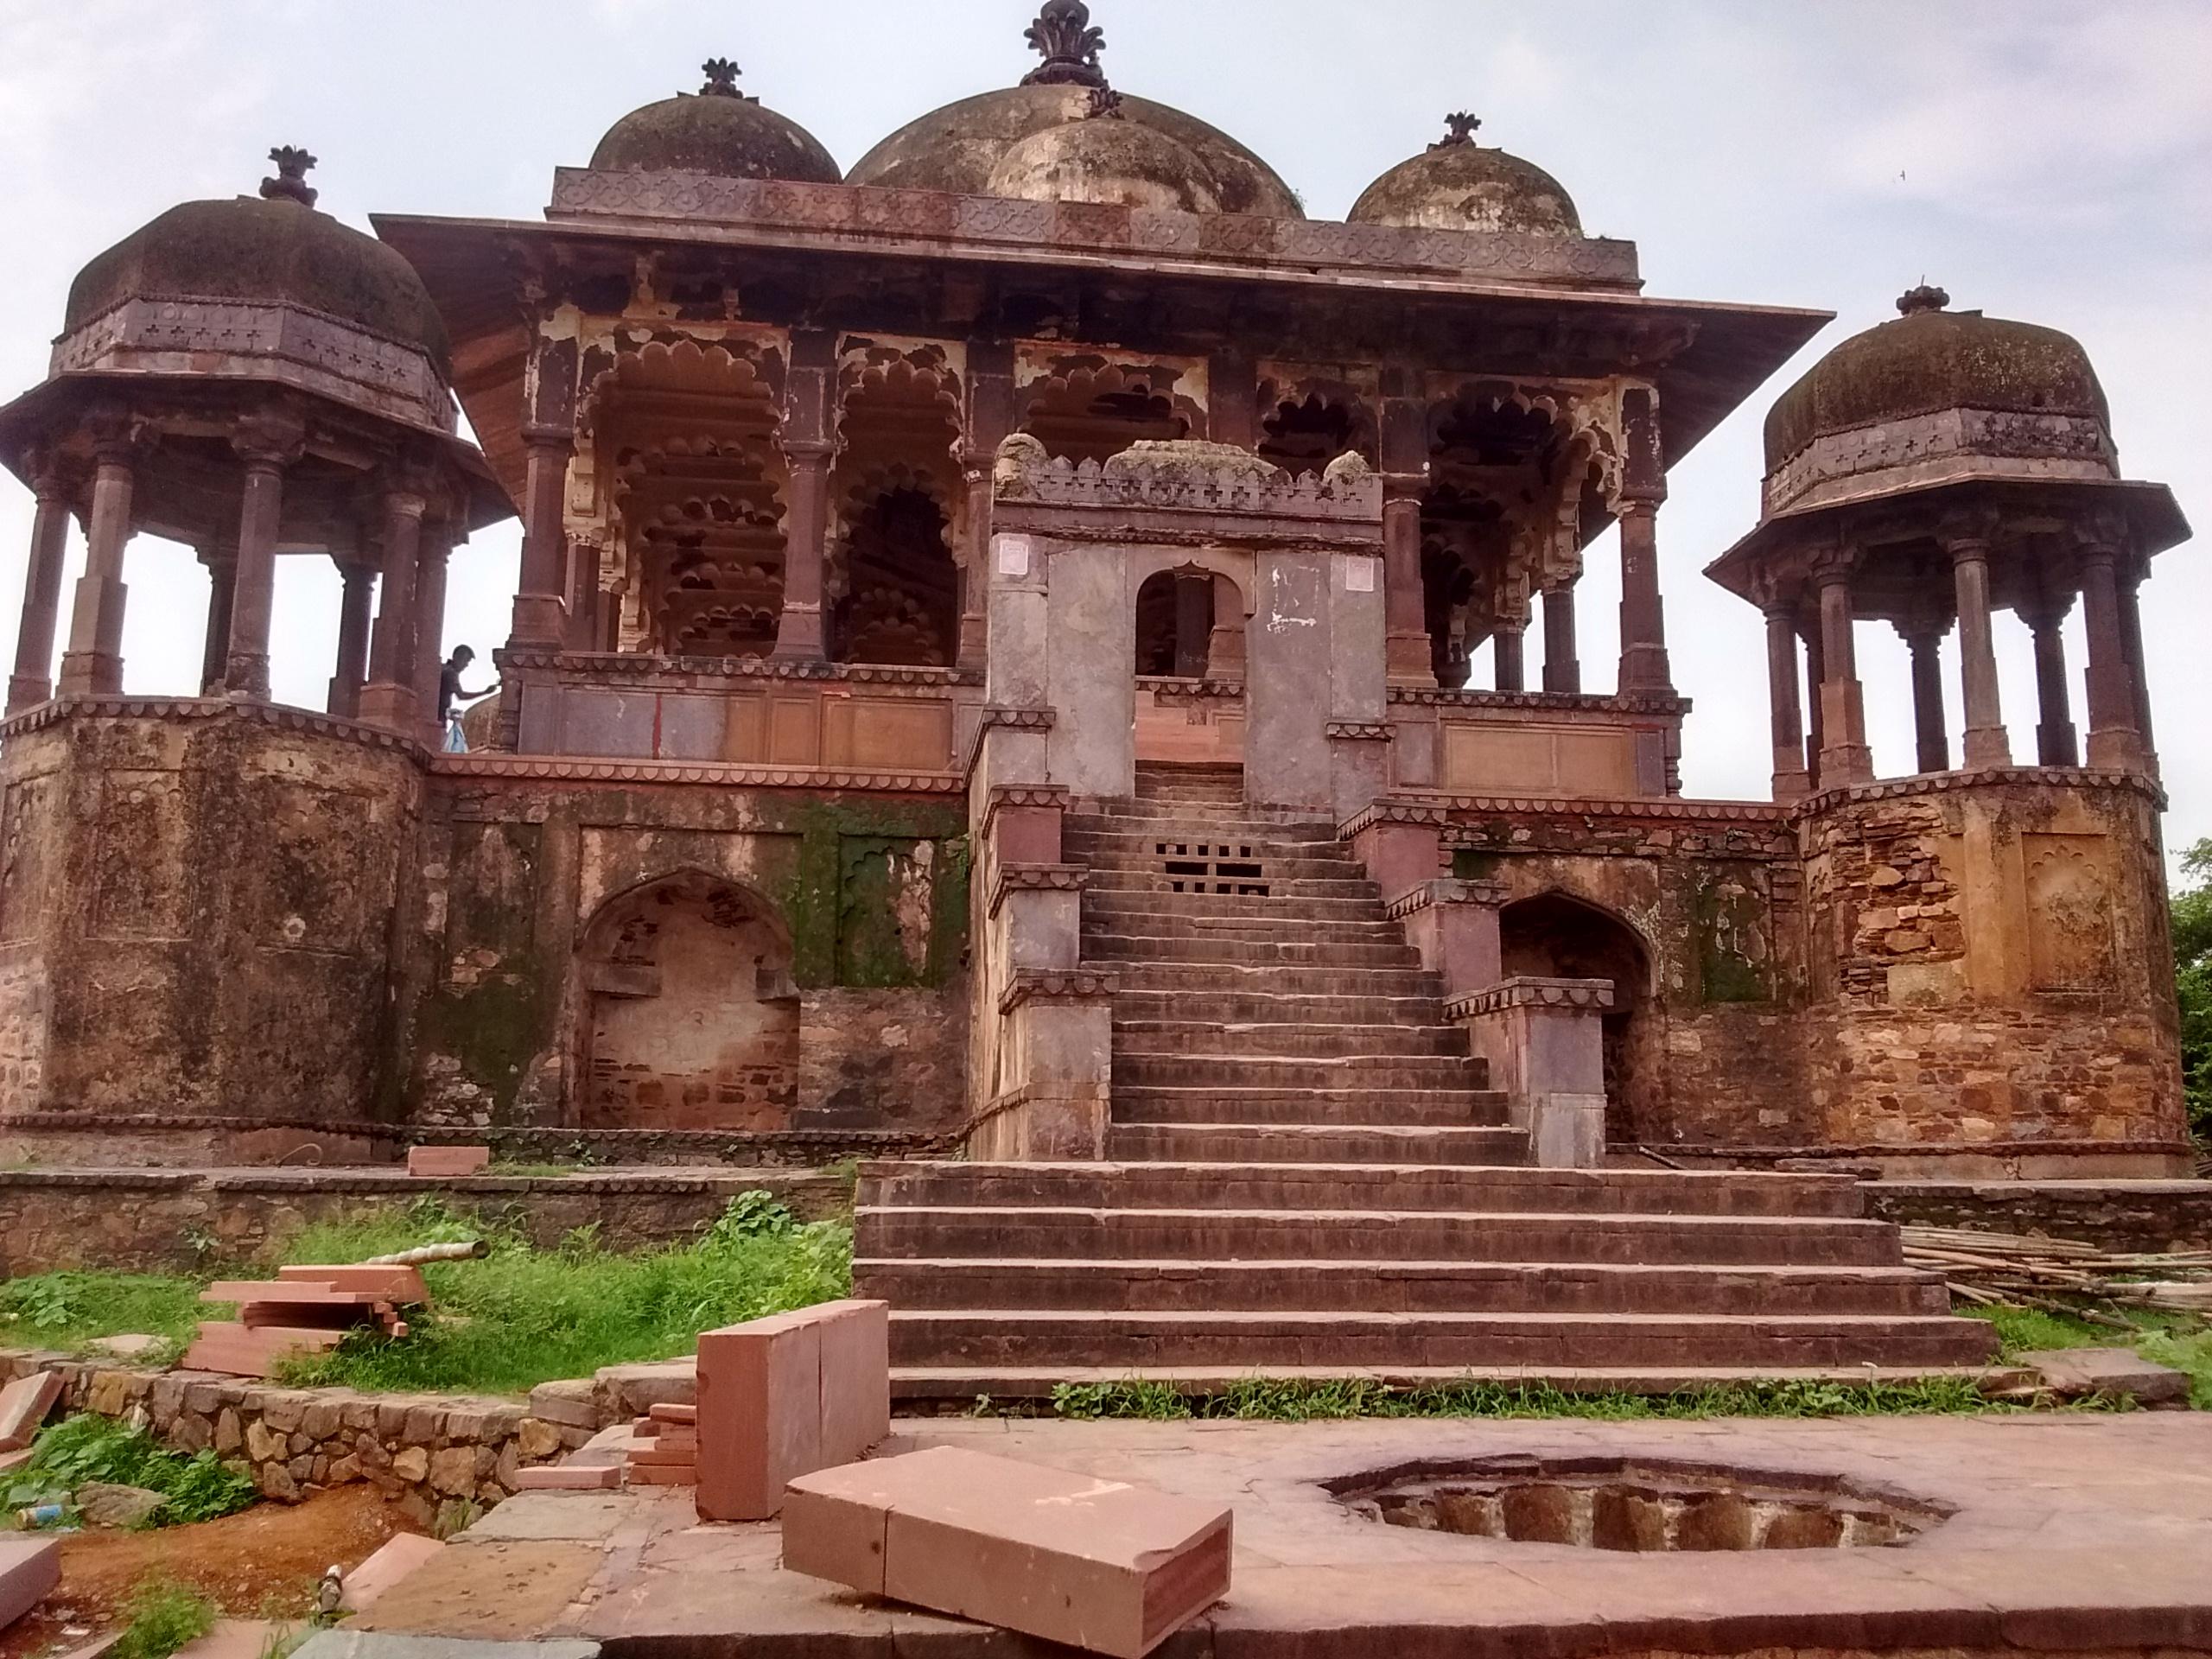 Ranthambore Fort ruins